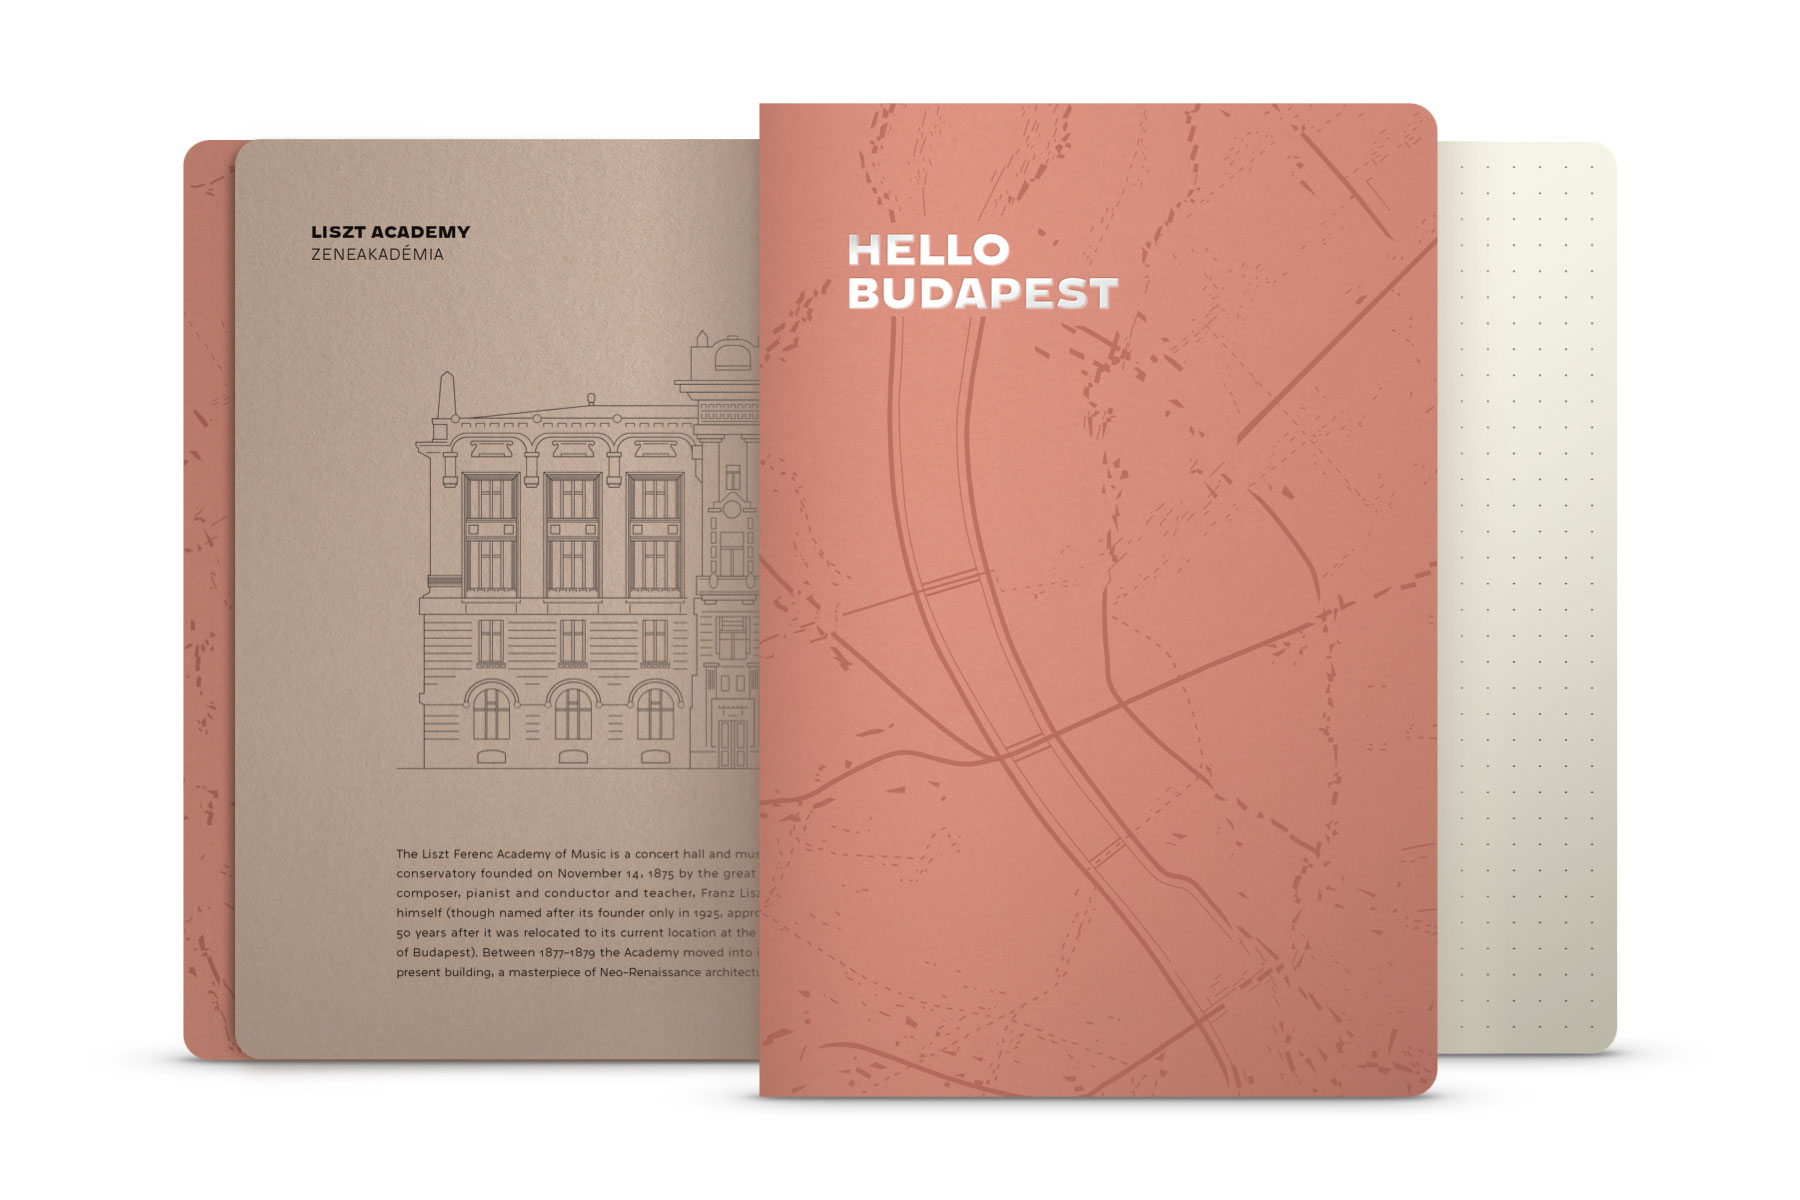 Hello Budapest eco-design notebook - Rosebud Edition